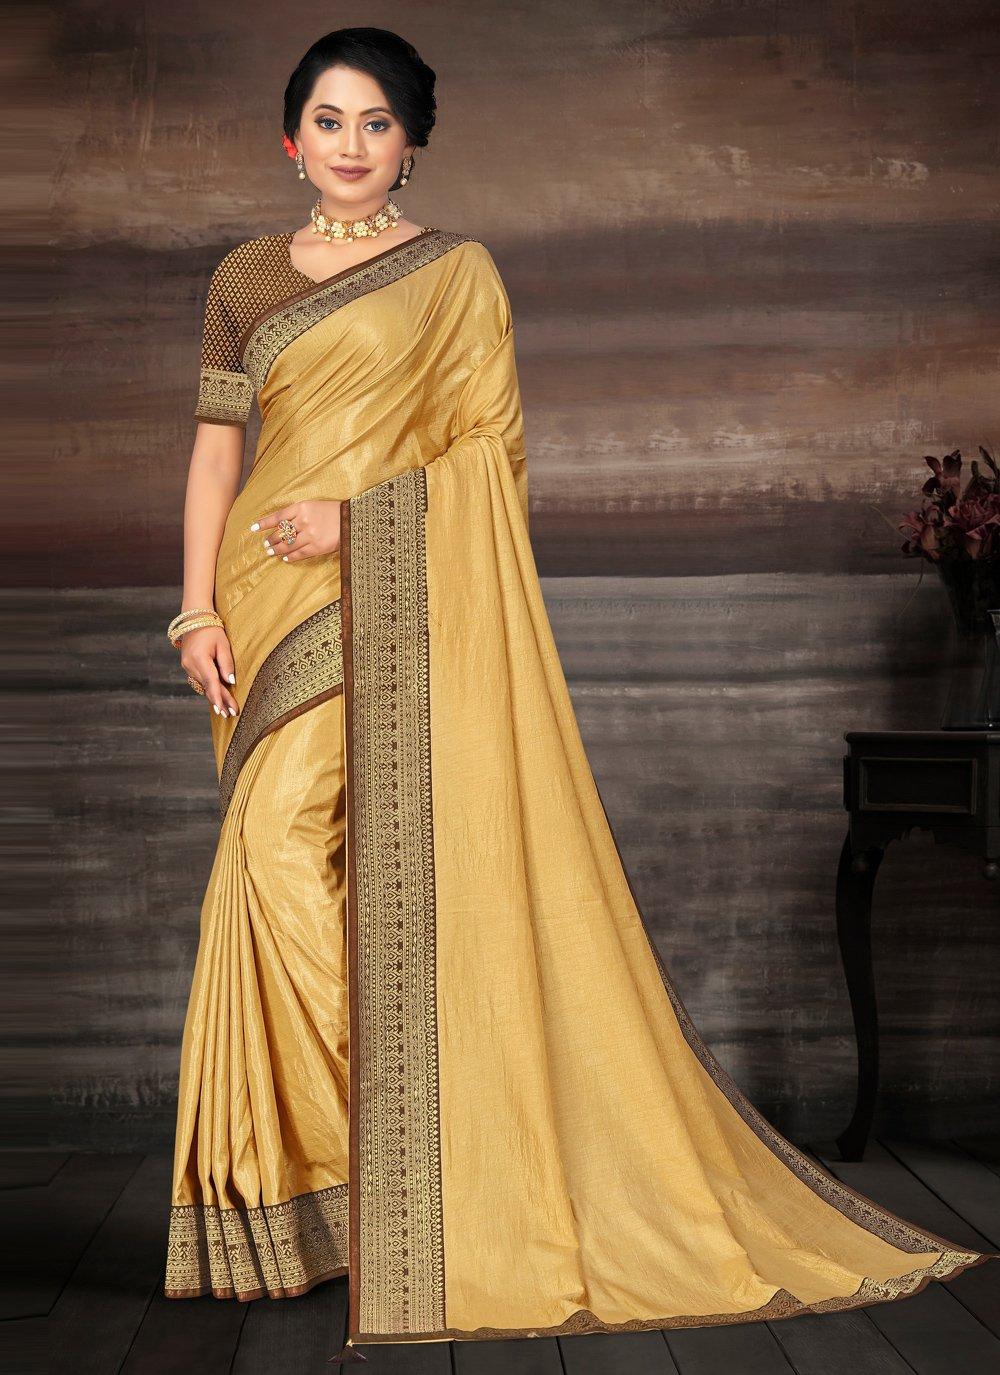 Lace Gold Bollywood Saree